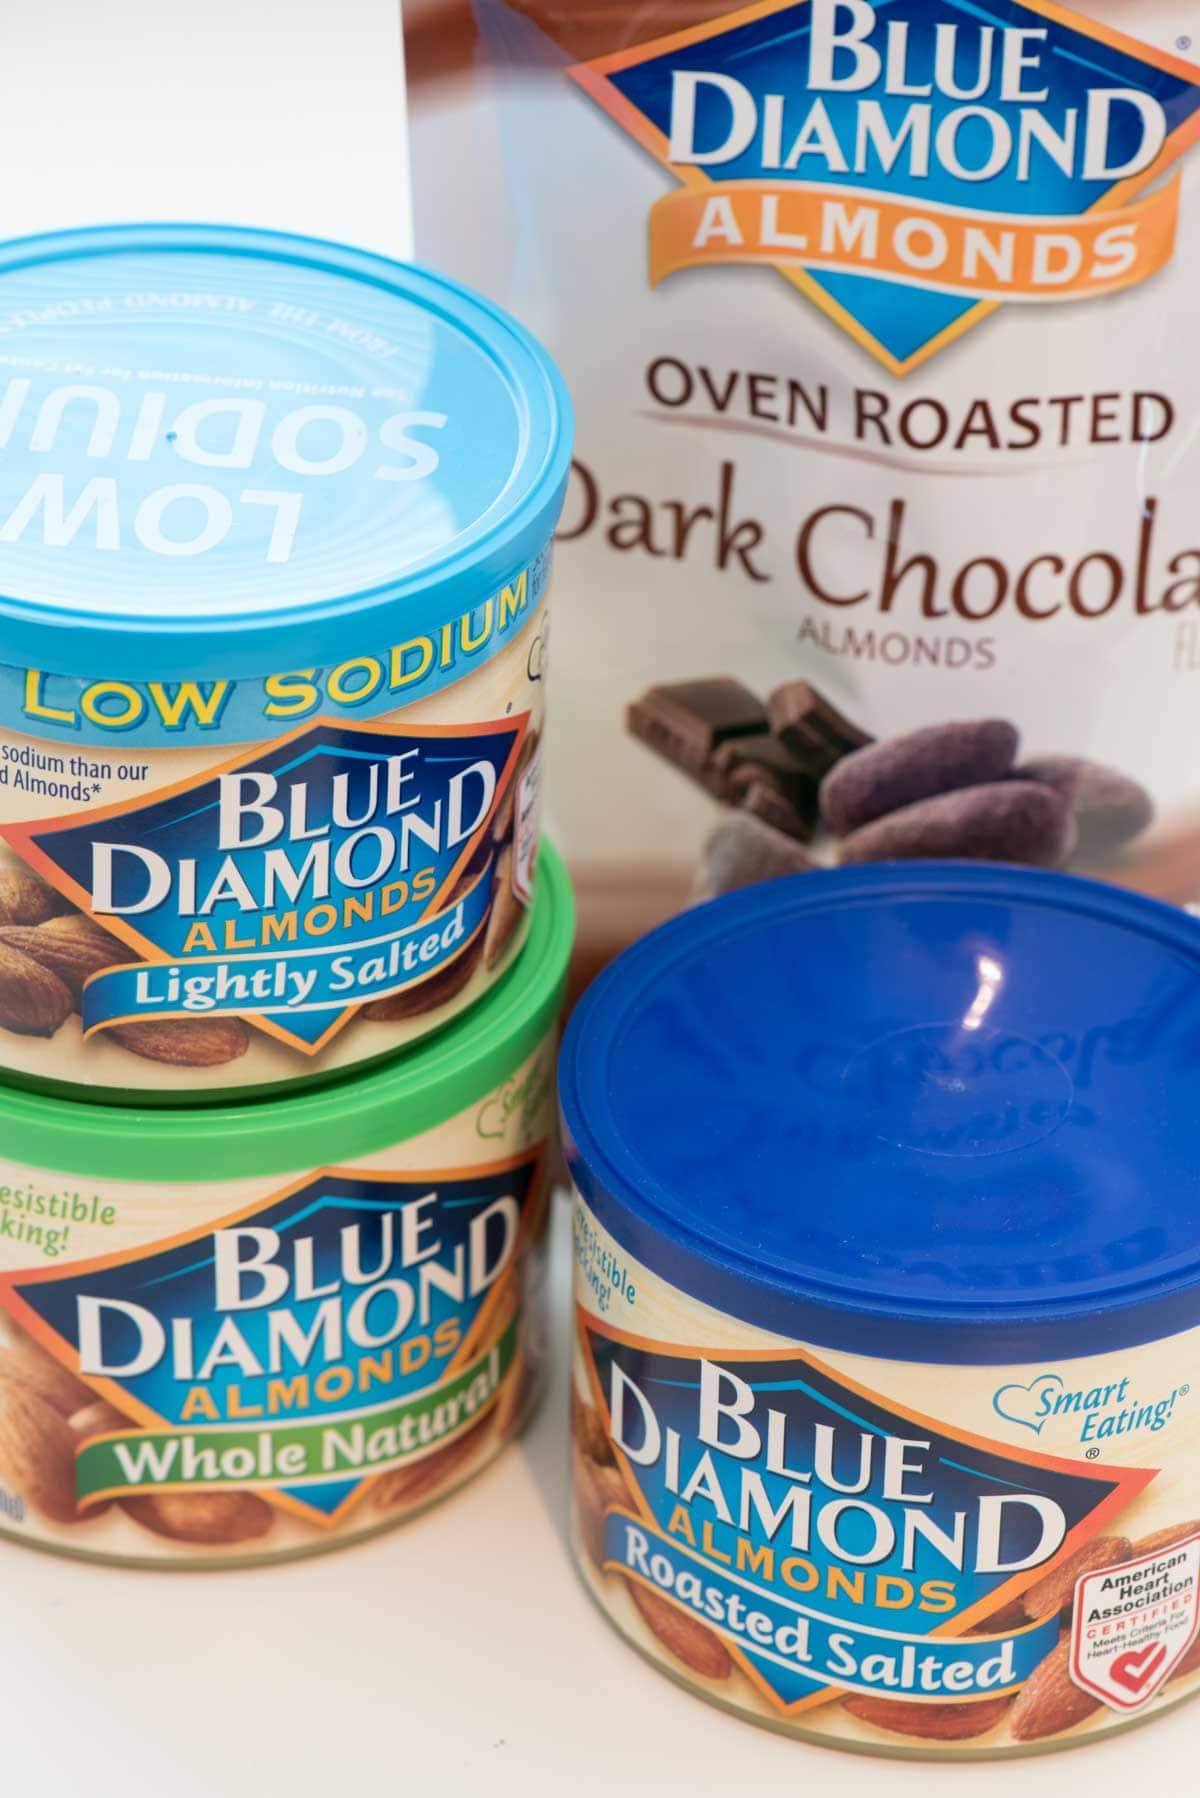 blue diamond almonds (1 of 1)